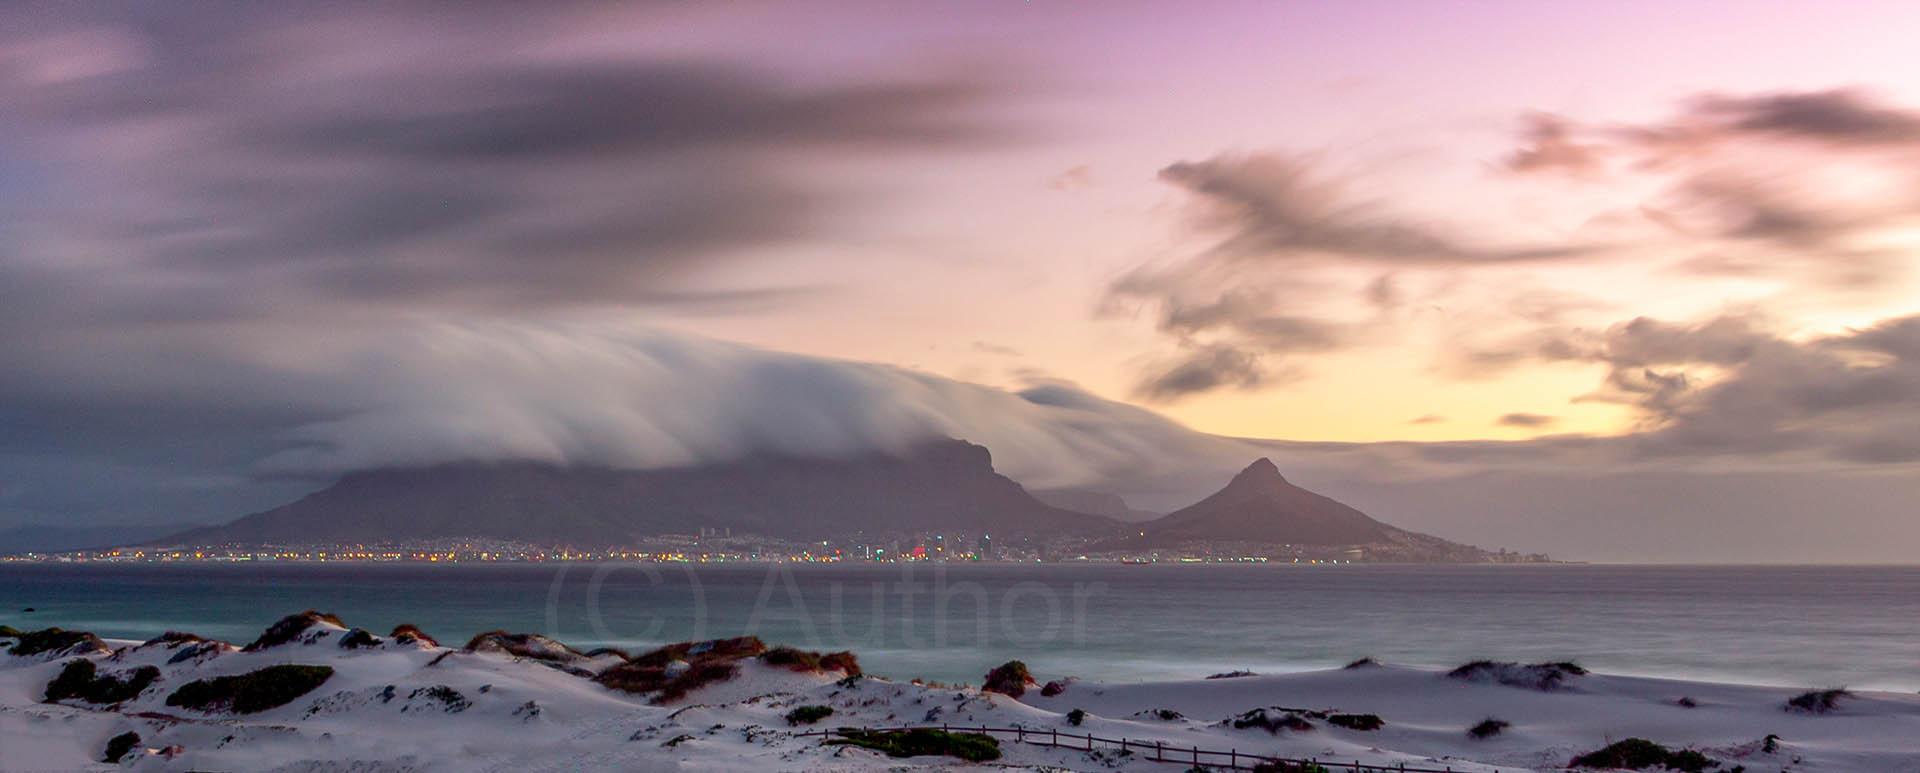 5_PI_Cape Town Sunset_David Wolstencroft